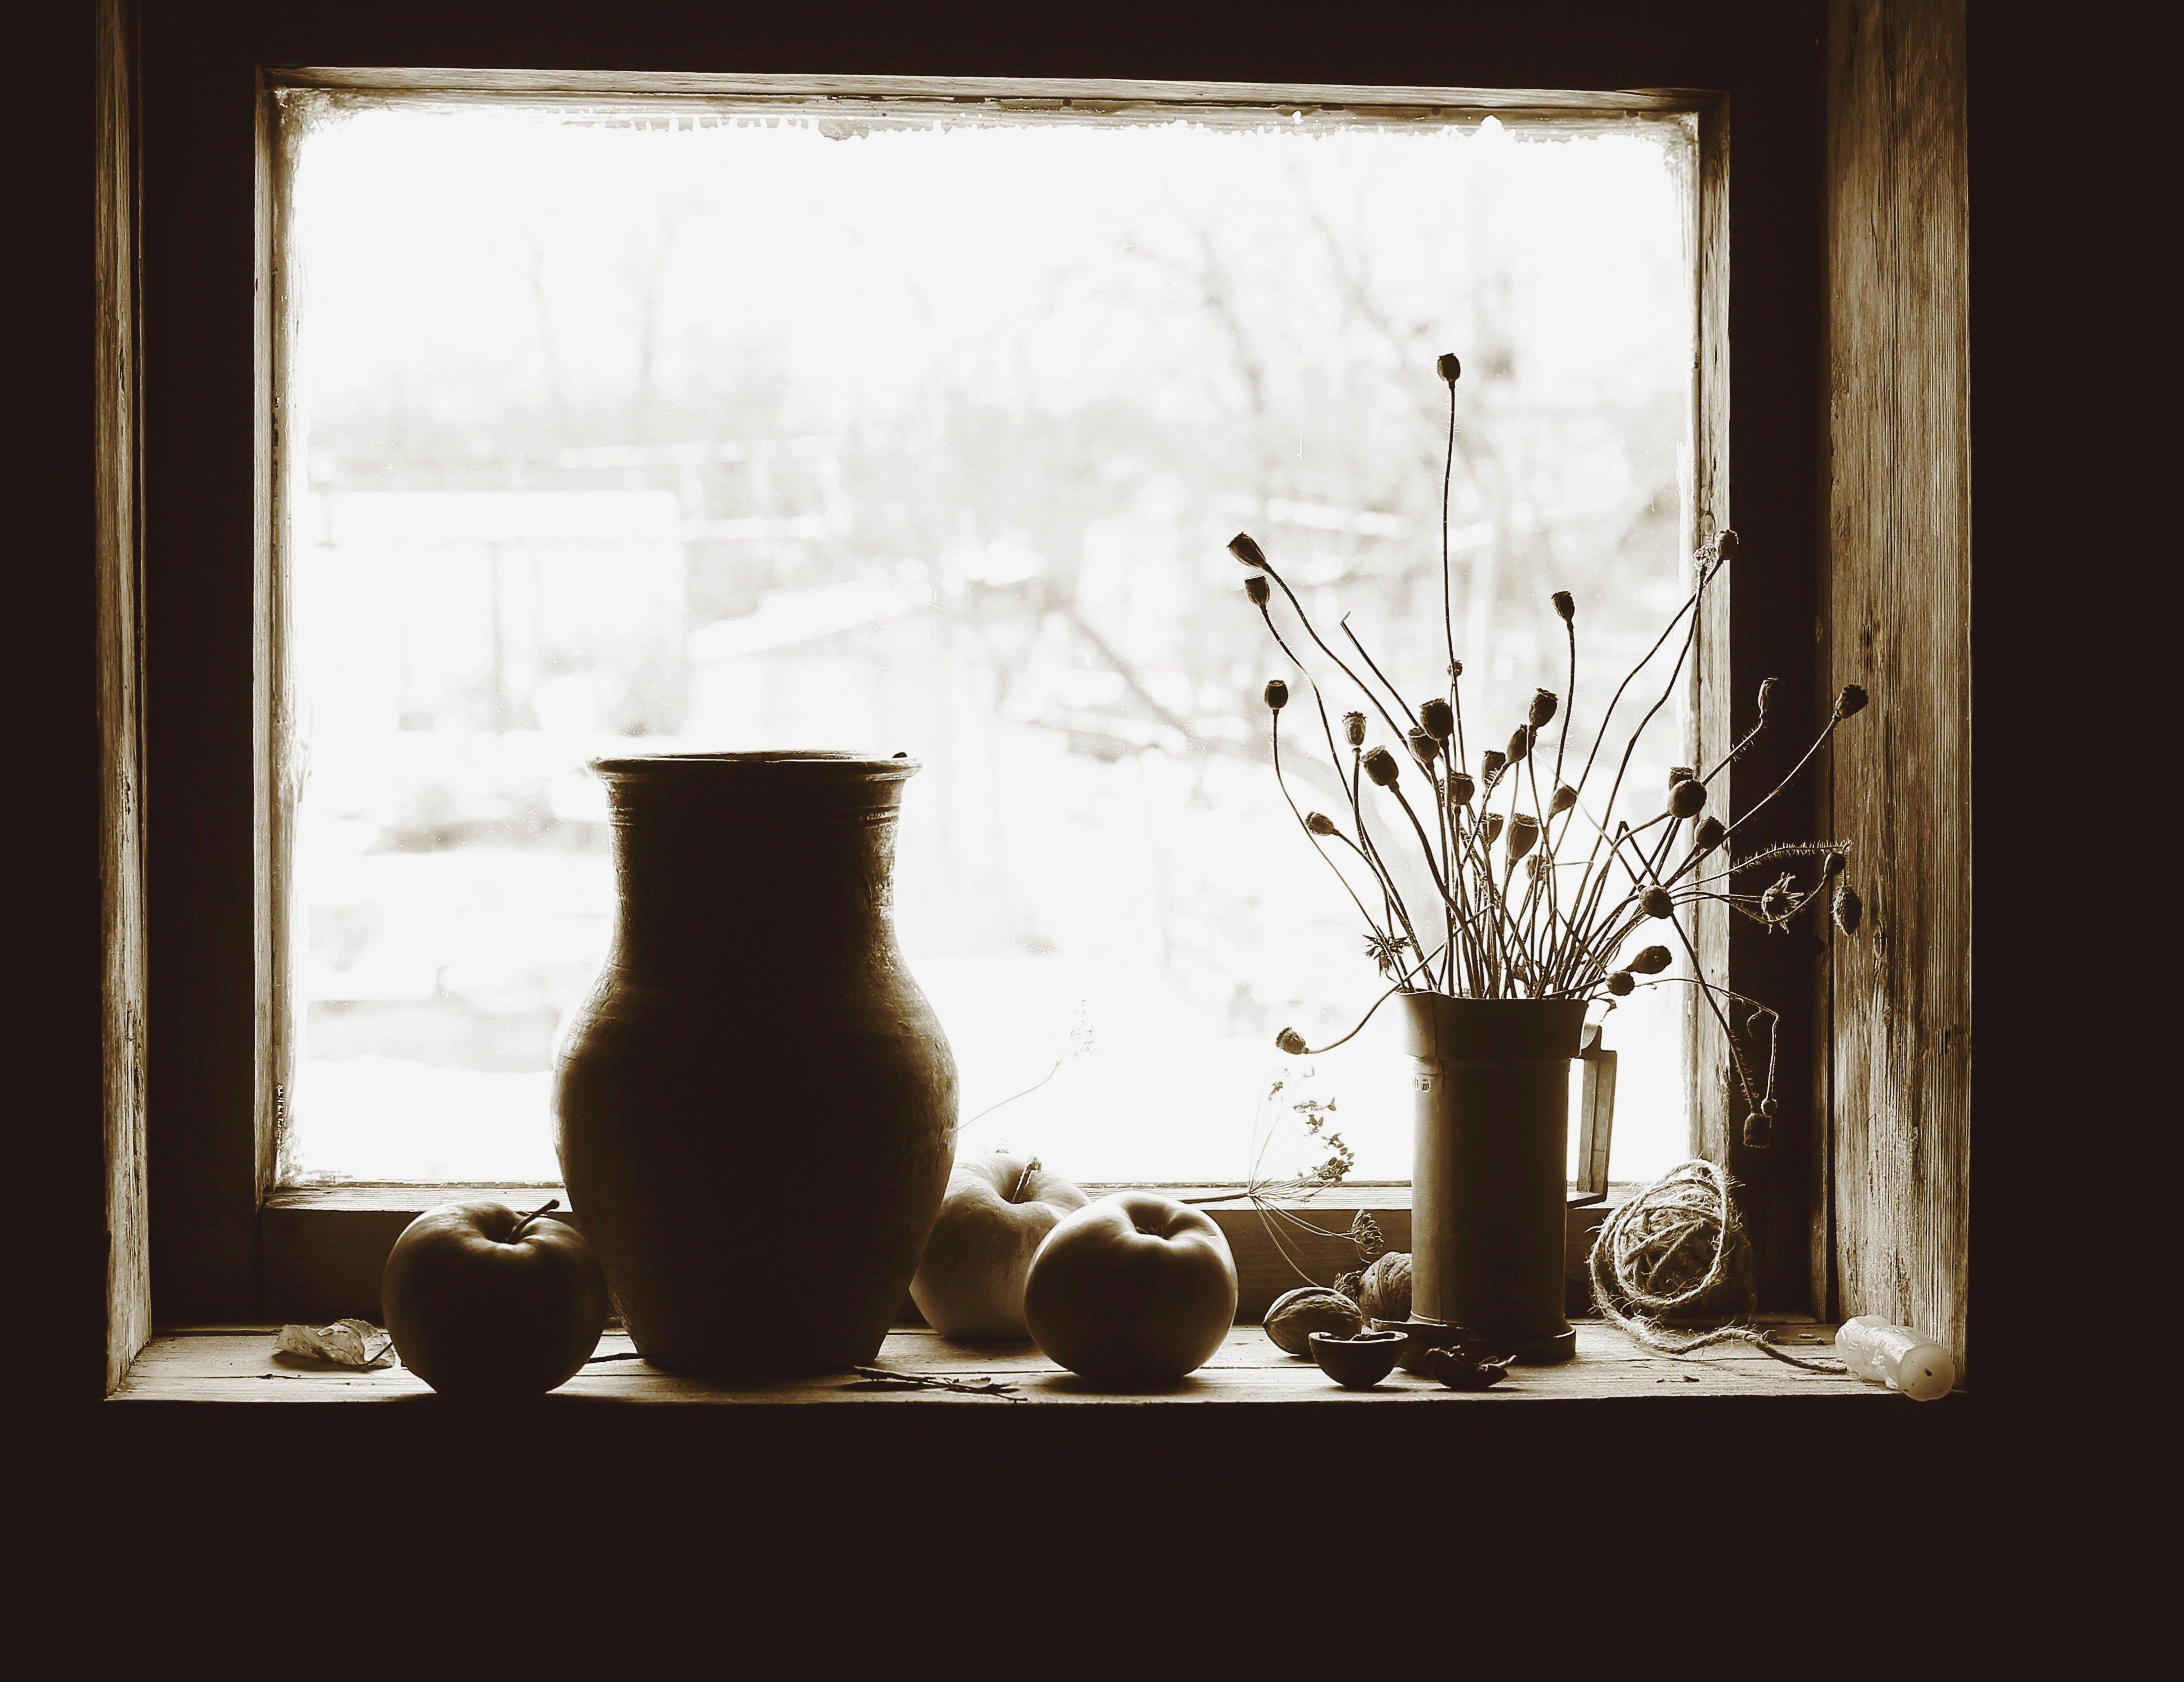 натюрморт, фотонатюрморт, окно, дом, зима, черно - белое, наталья казанцева, Казанцева Наталья